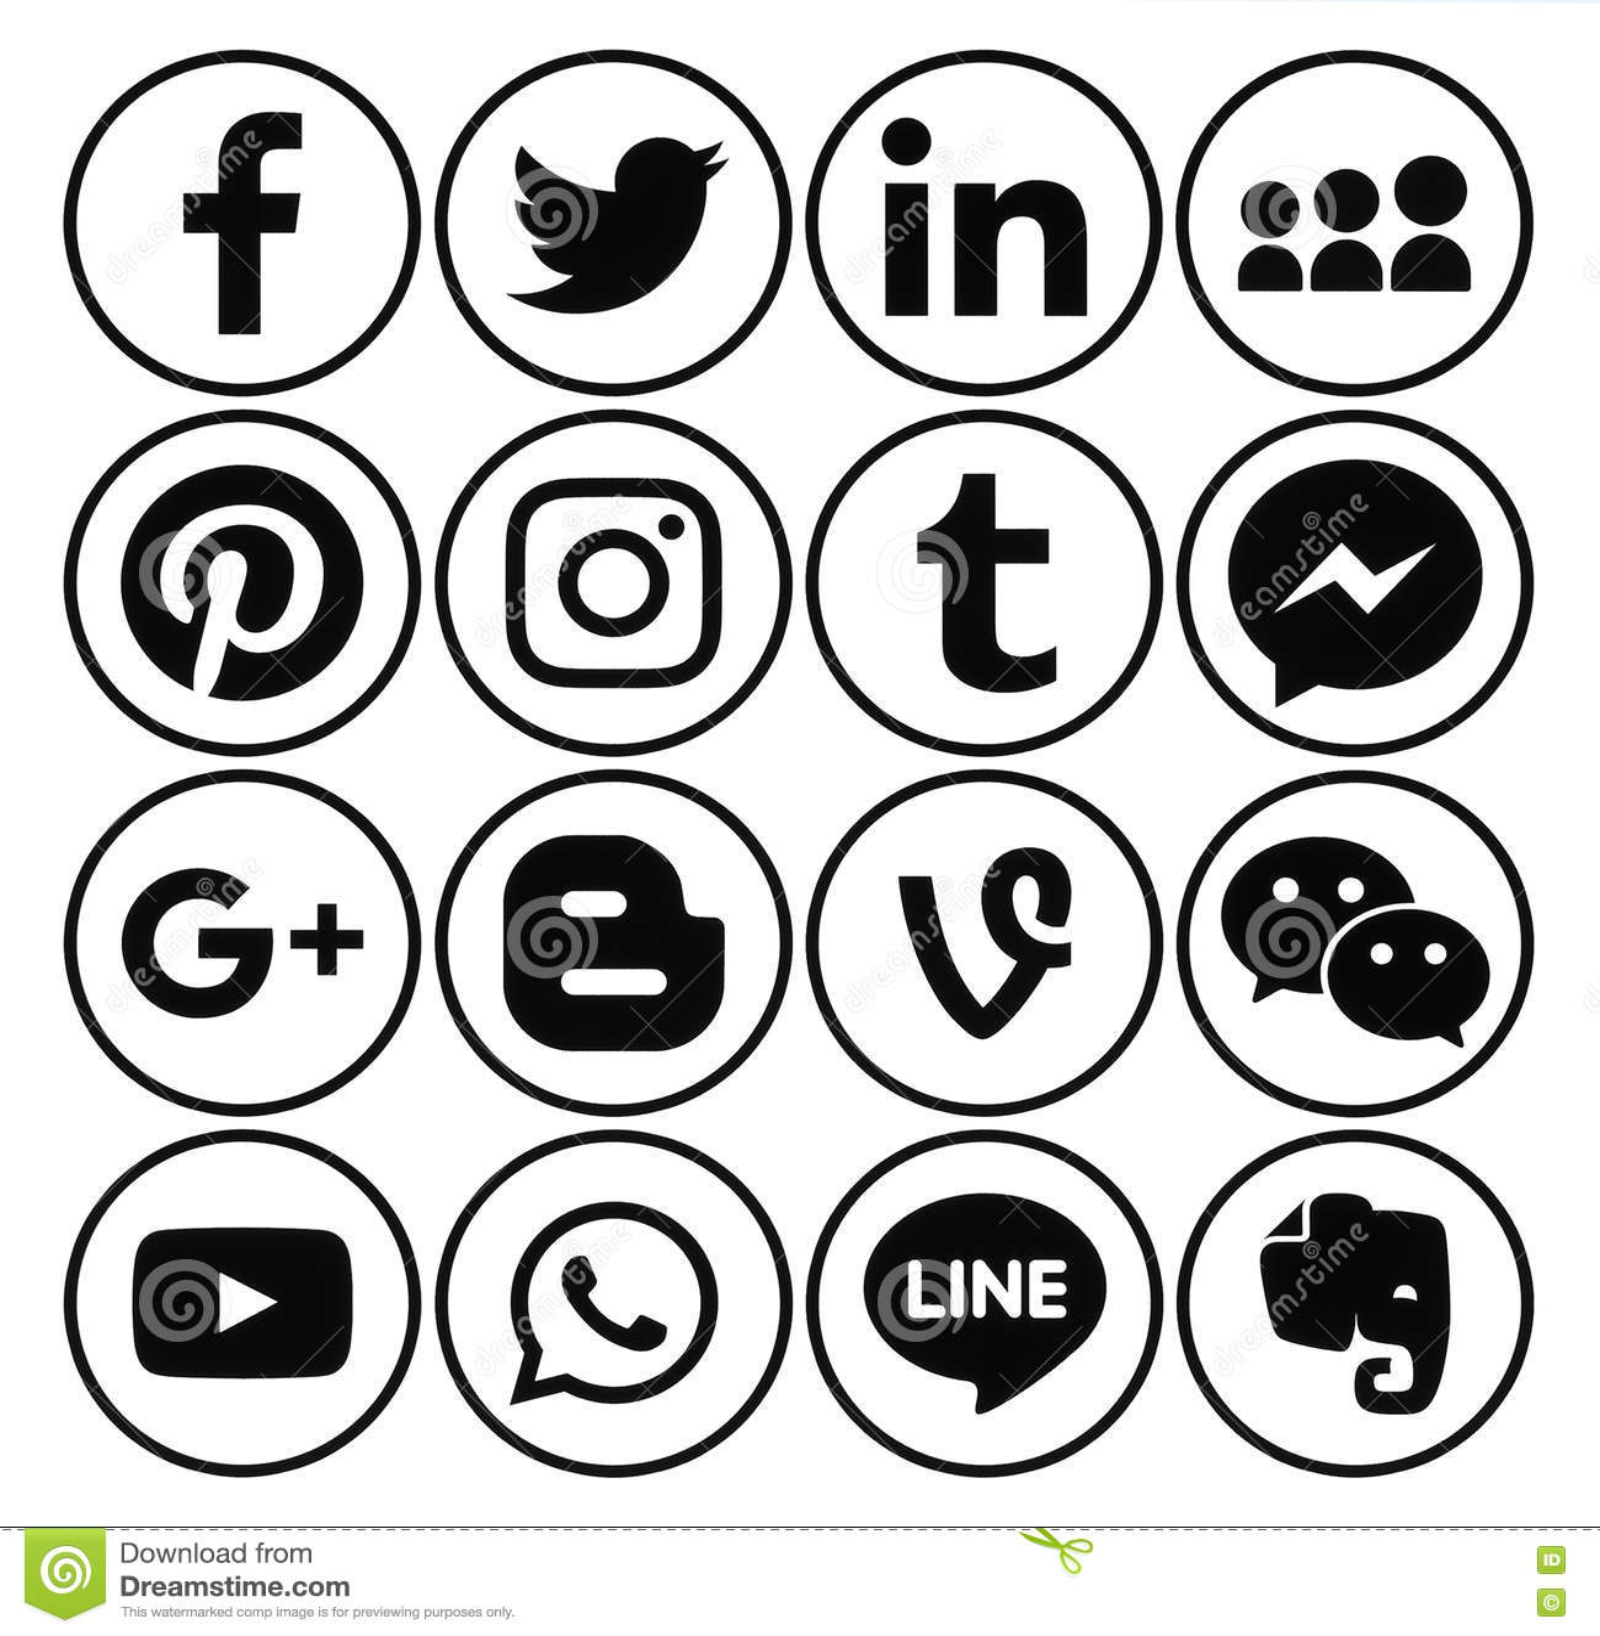 Line Art Emojis : Round white social media buttons pixshark